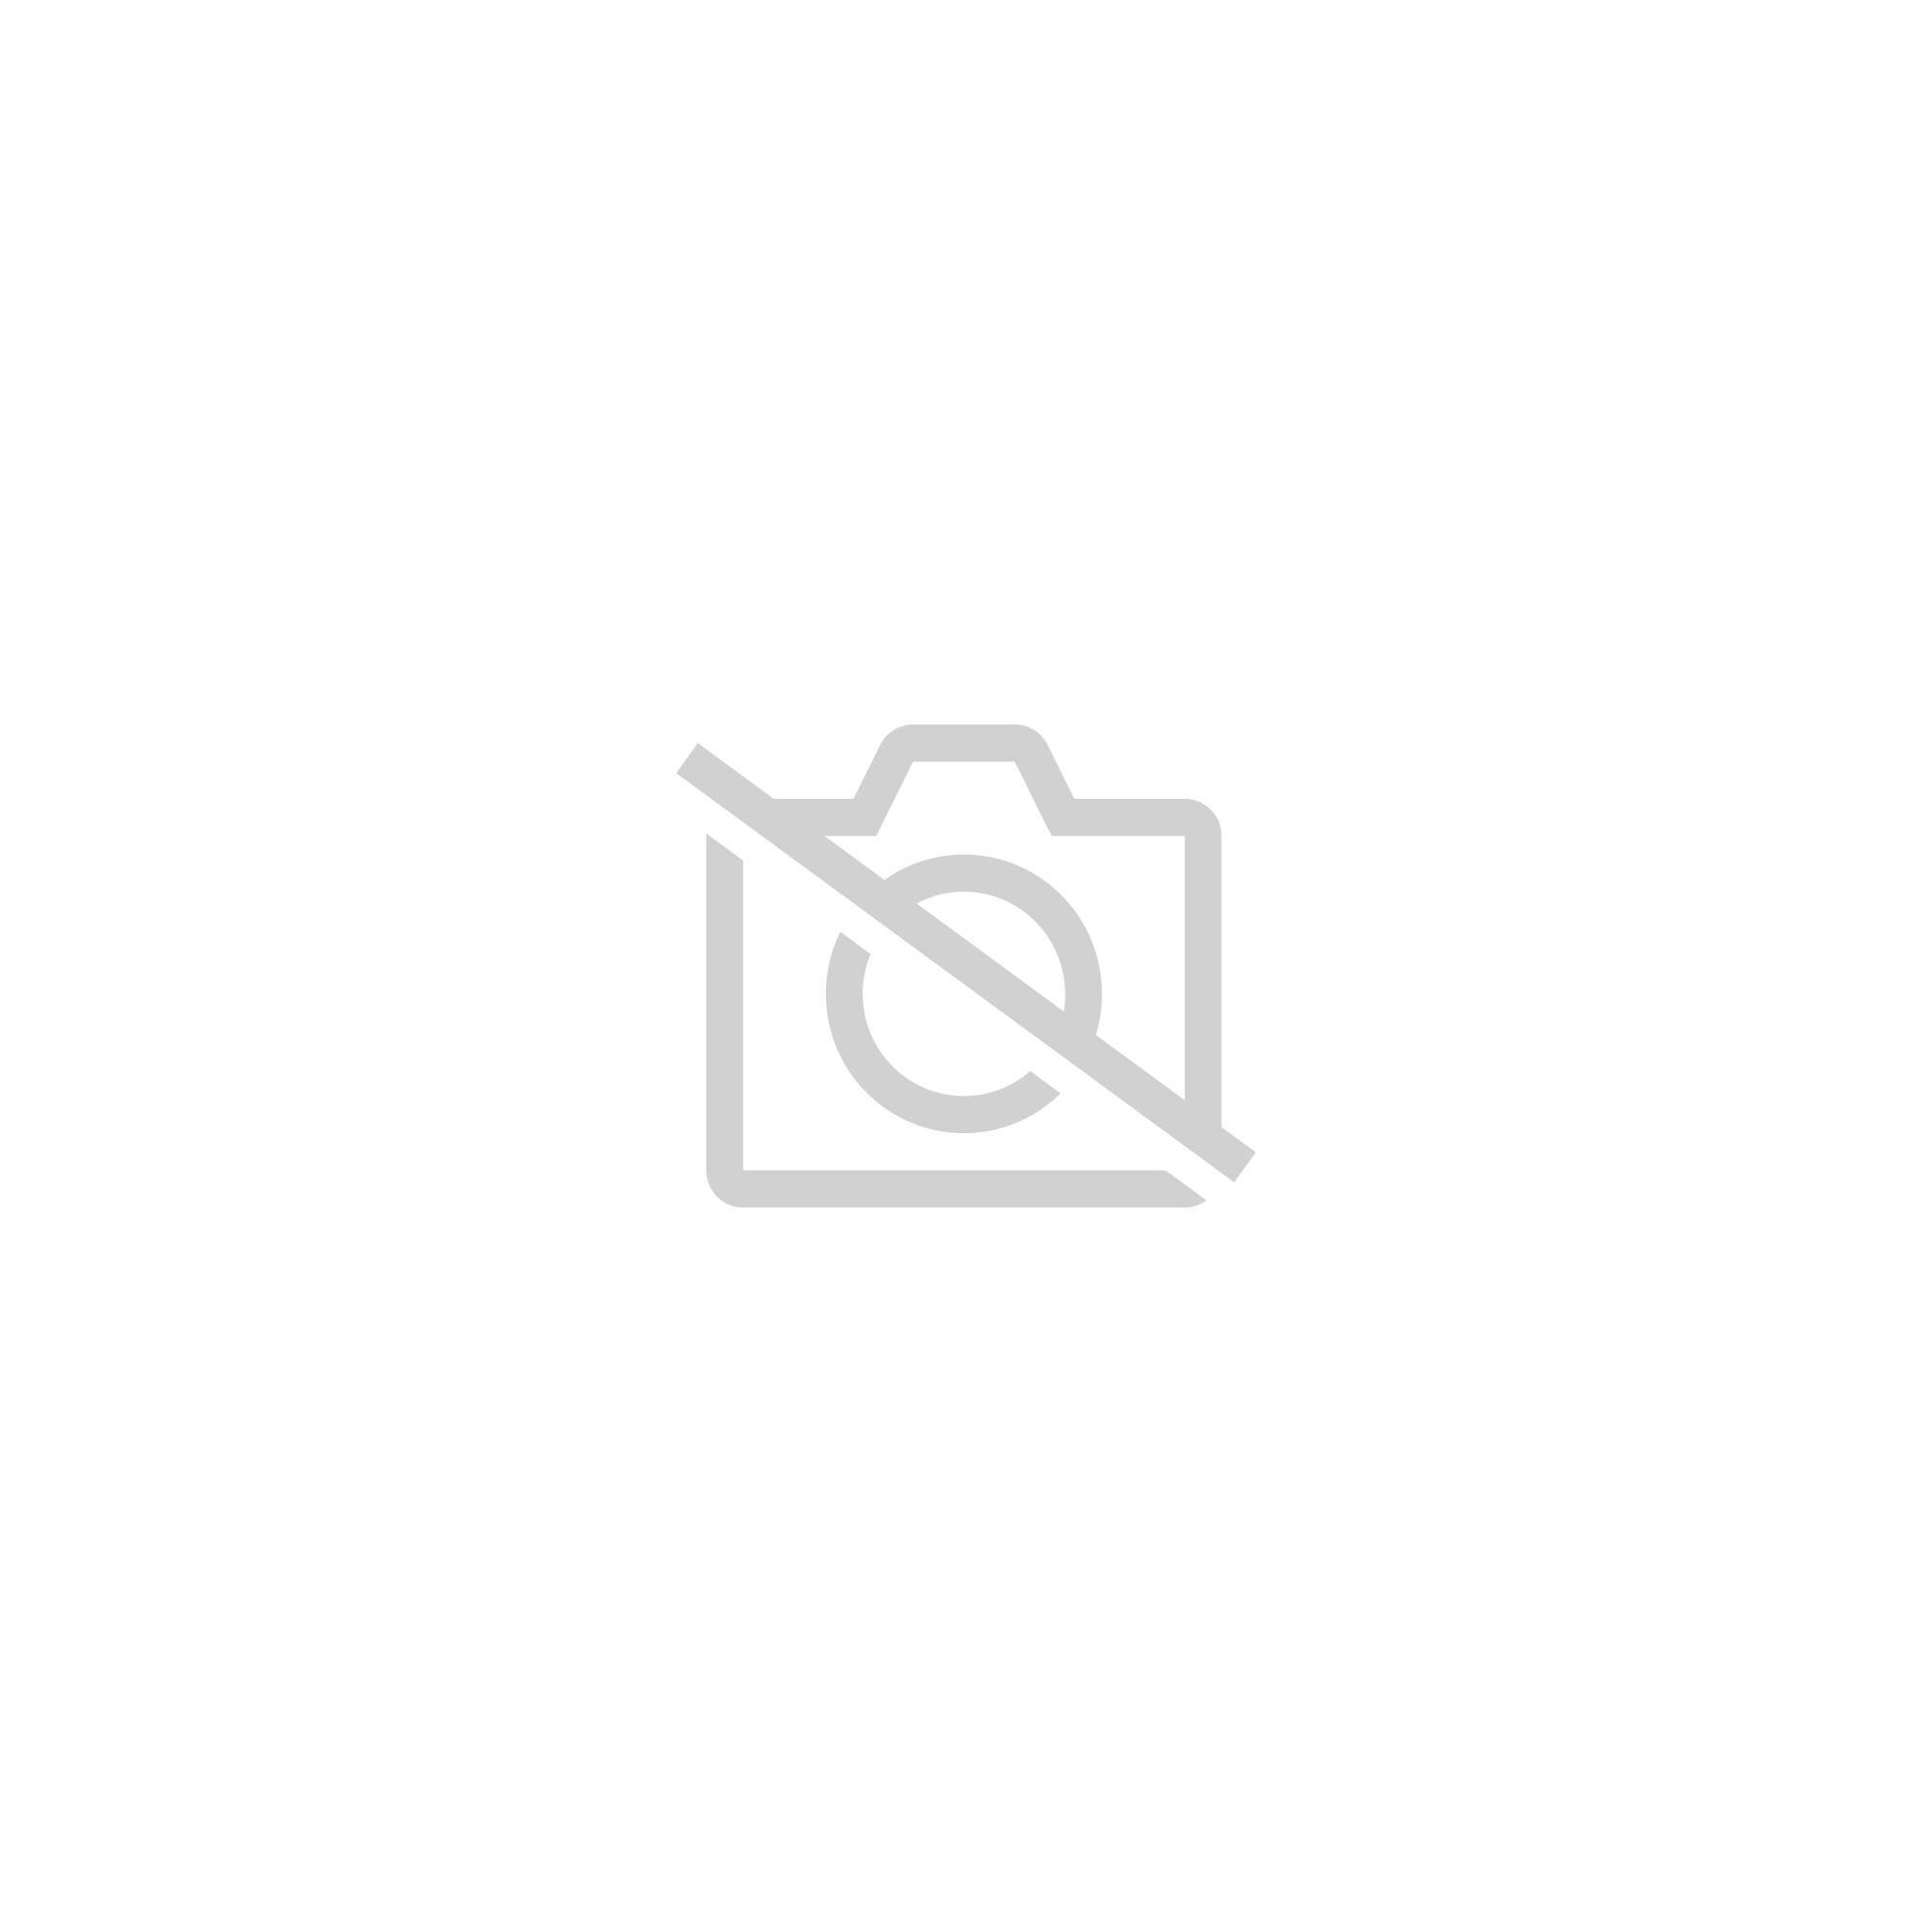 Pack Tente 400w Probox 120 - Eti + Grolux